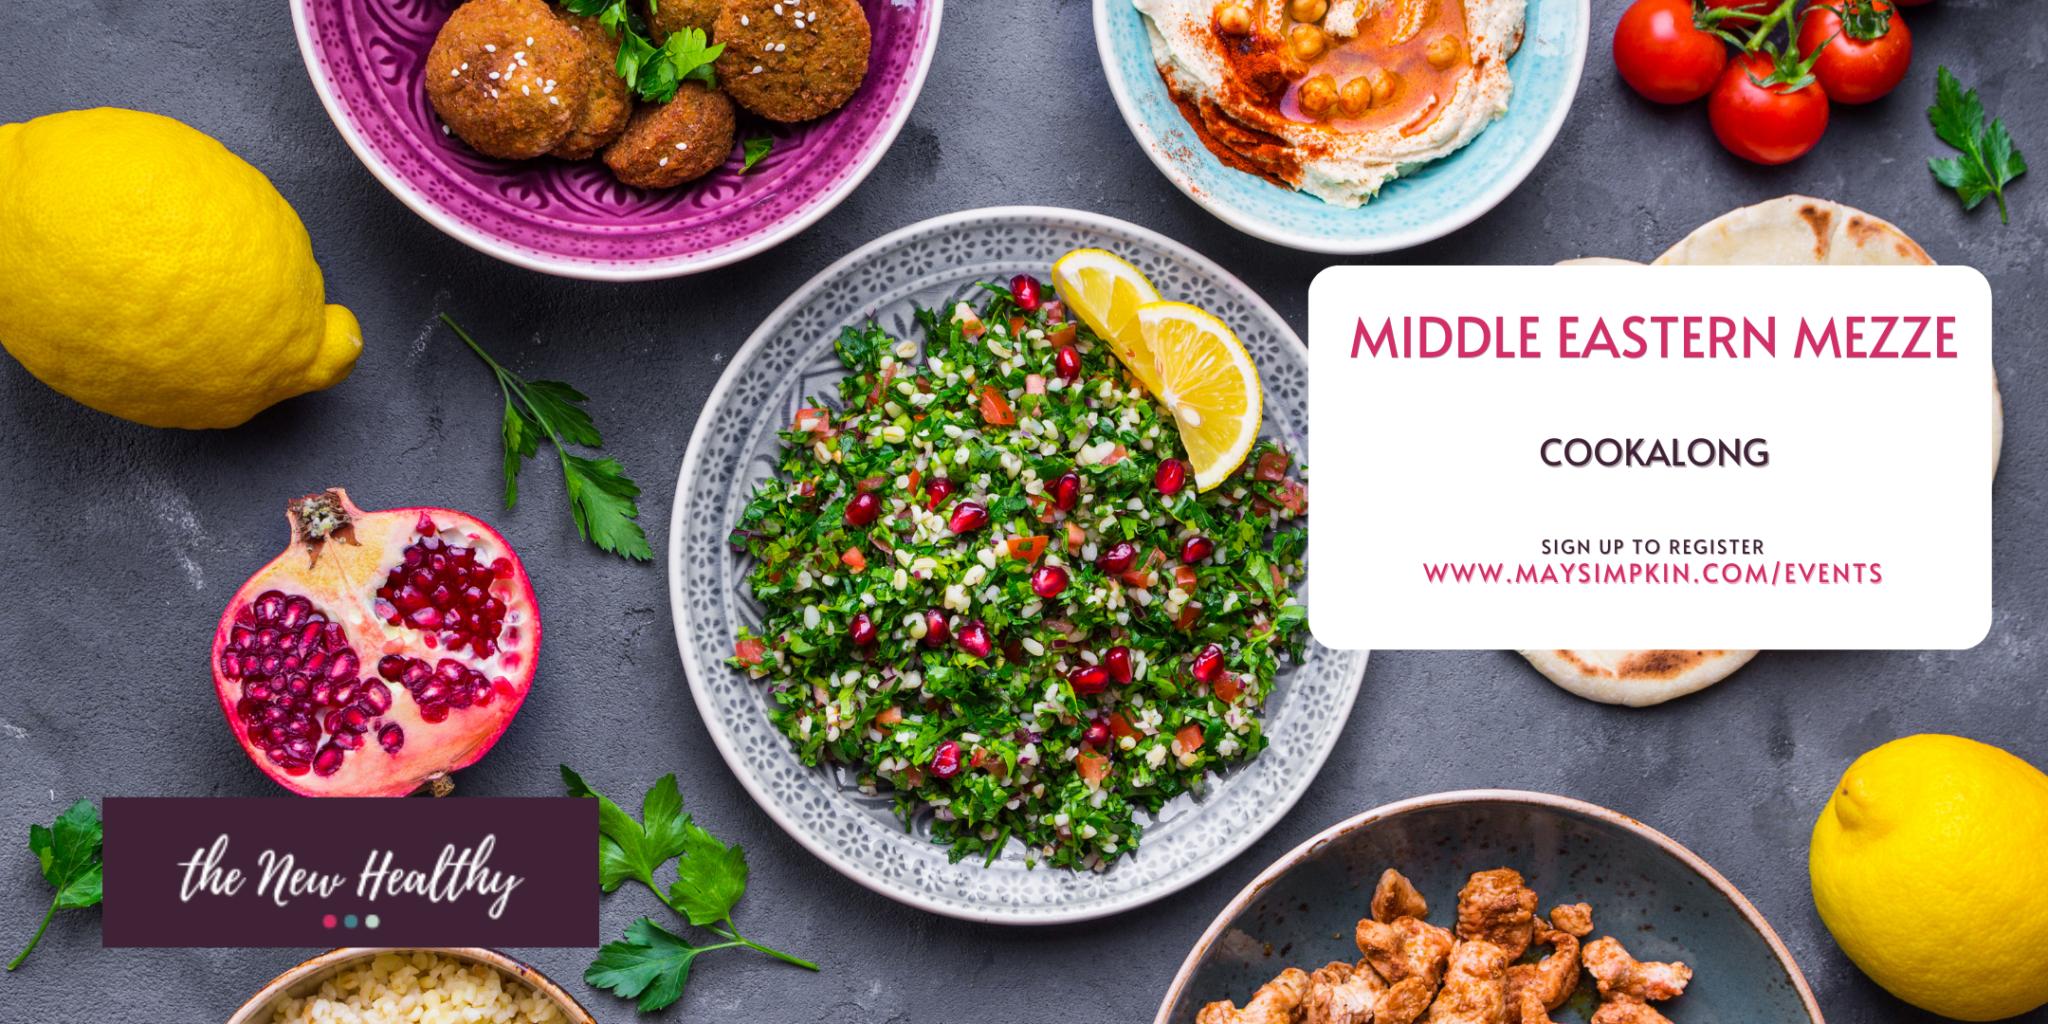 Middle Eastern Mezze Cookalong